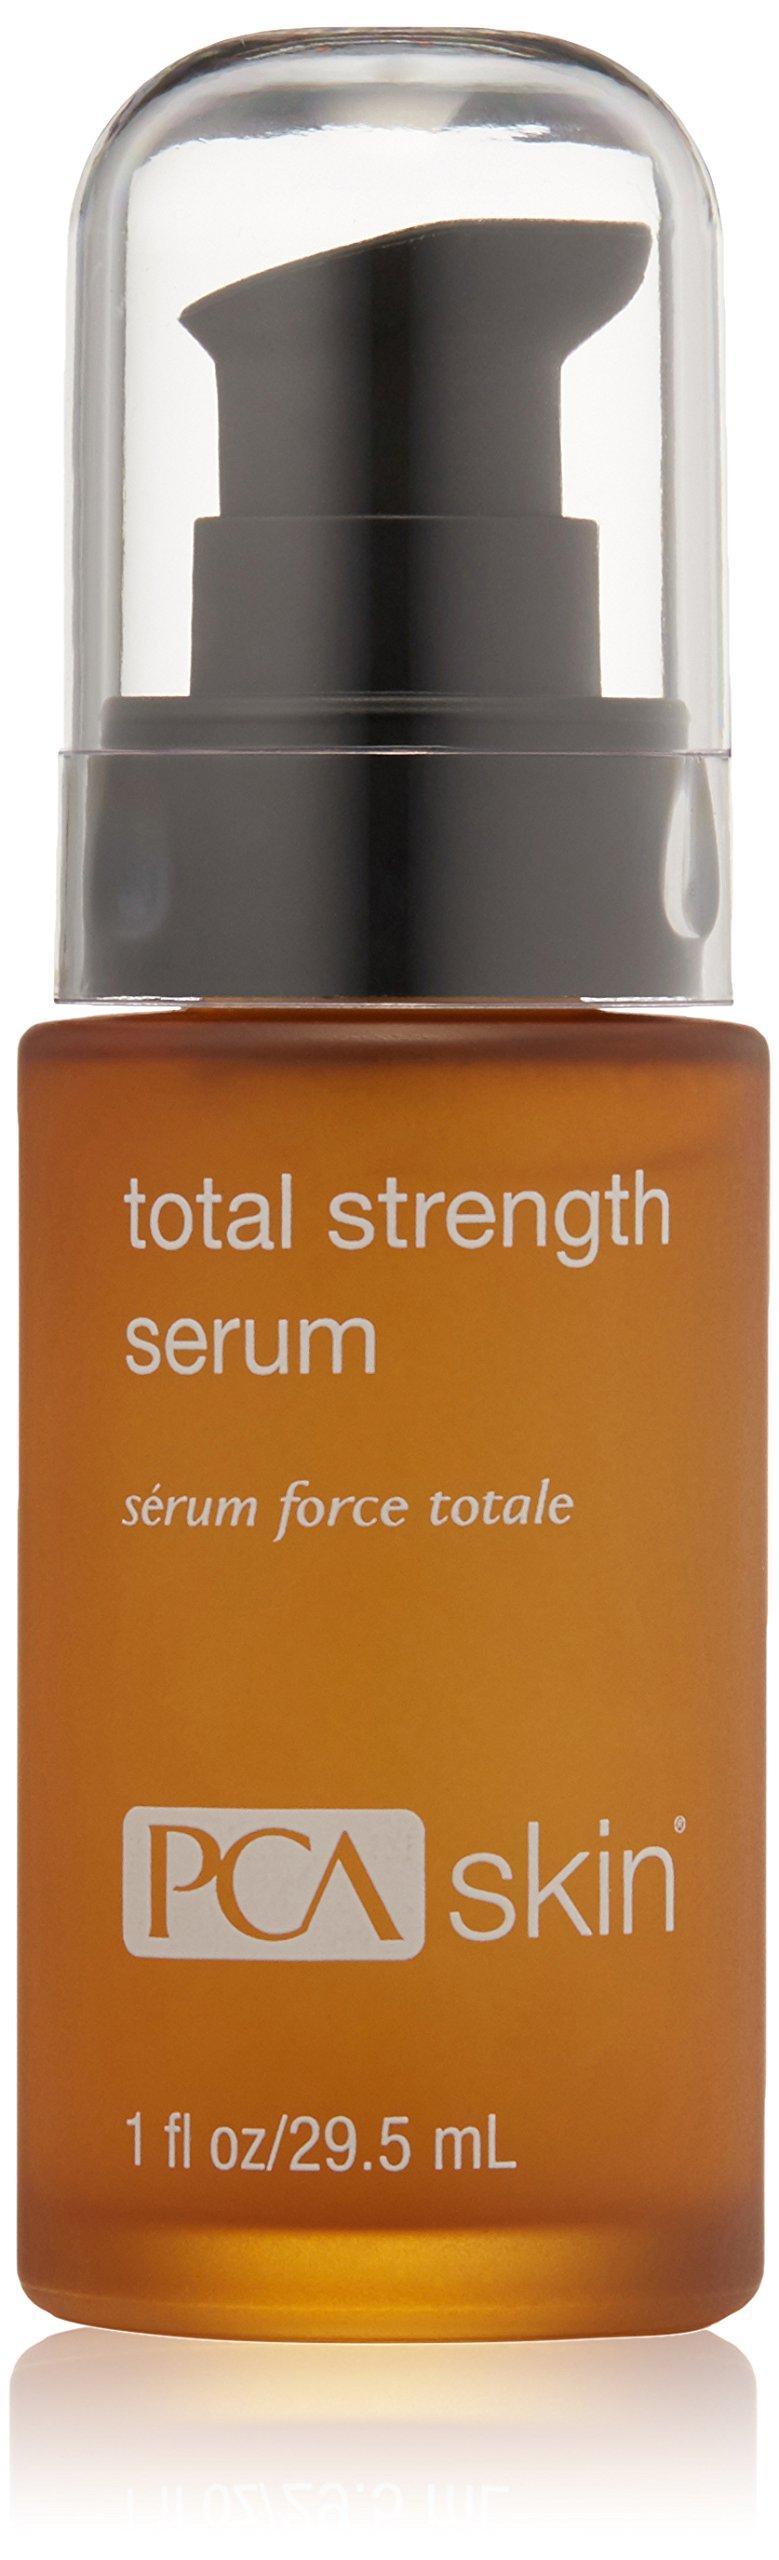 PCA Skin Total Strength Serum, 1.0 Fluid Ounce